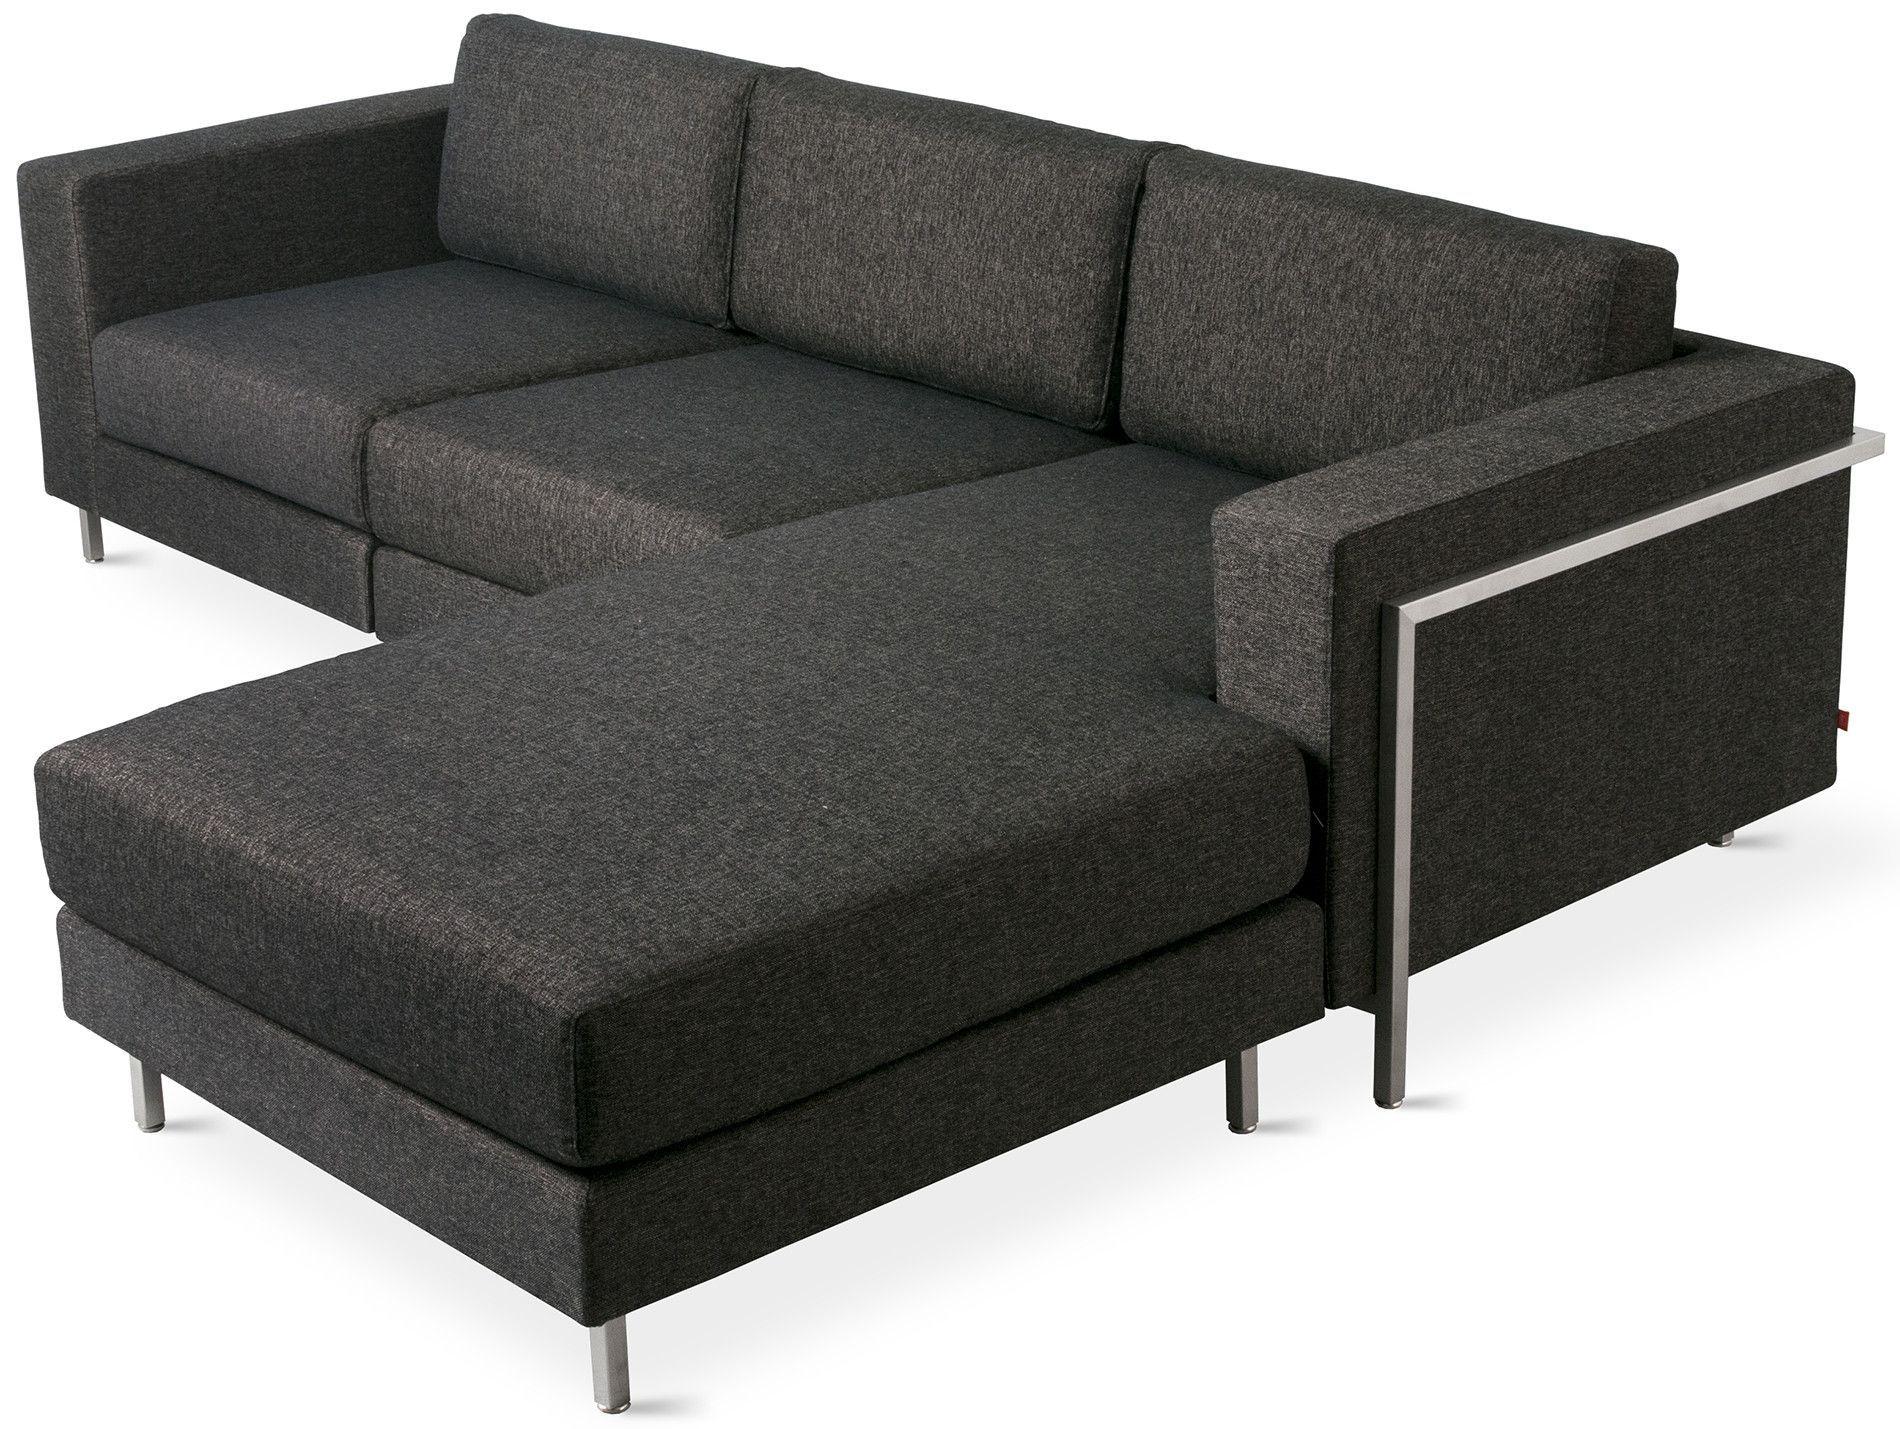 Davenport Bi Sectional Sectional Sofa Modern Sofa Gus Modern Sofa